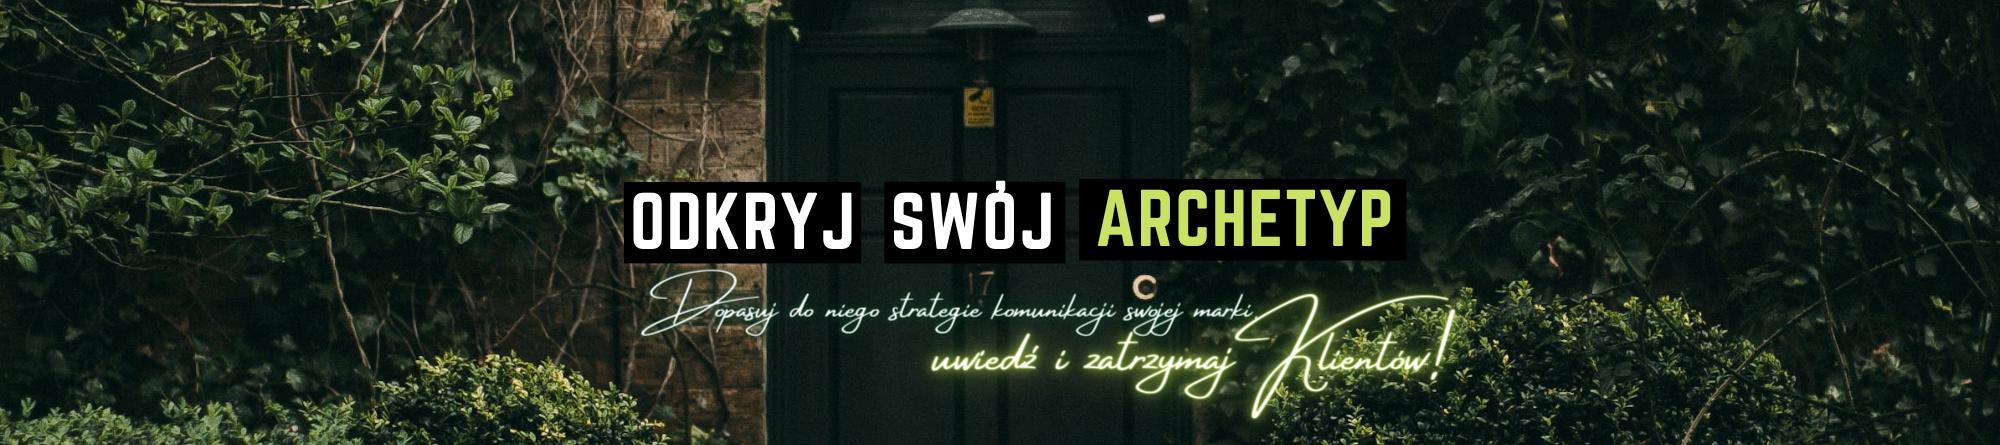 archetyp marki_Ideas Factory